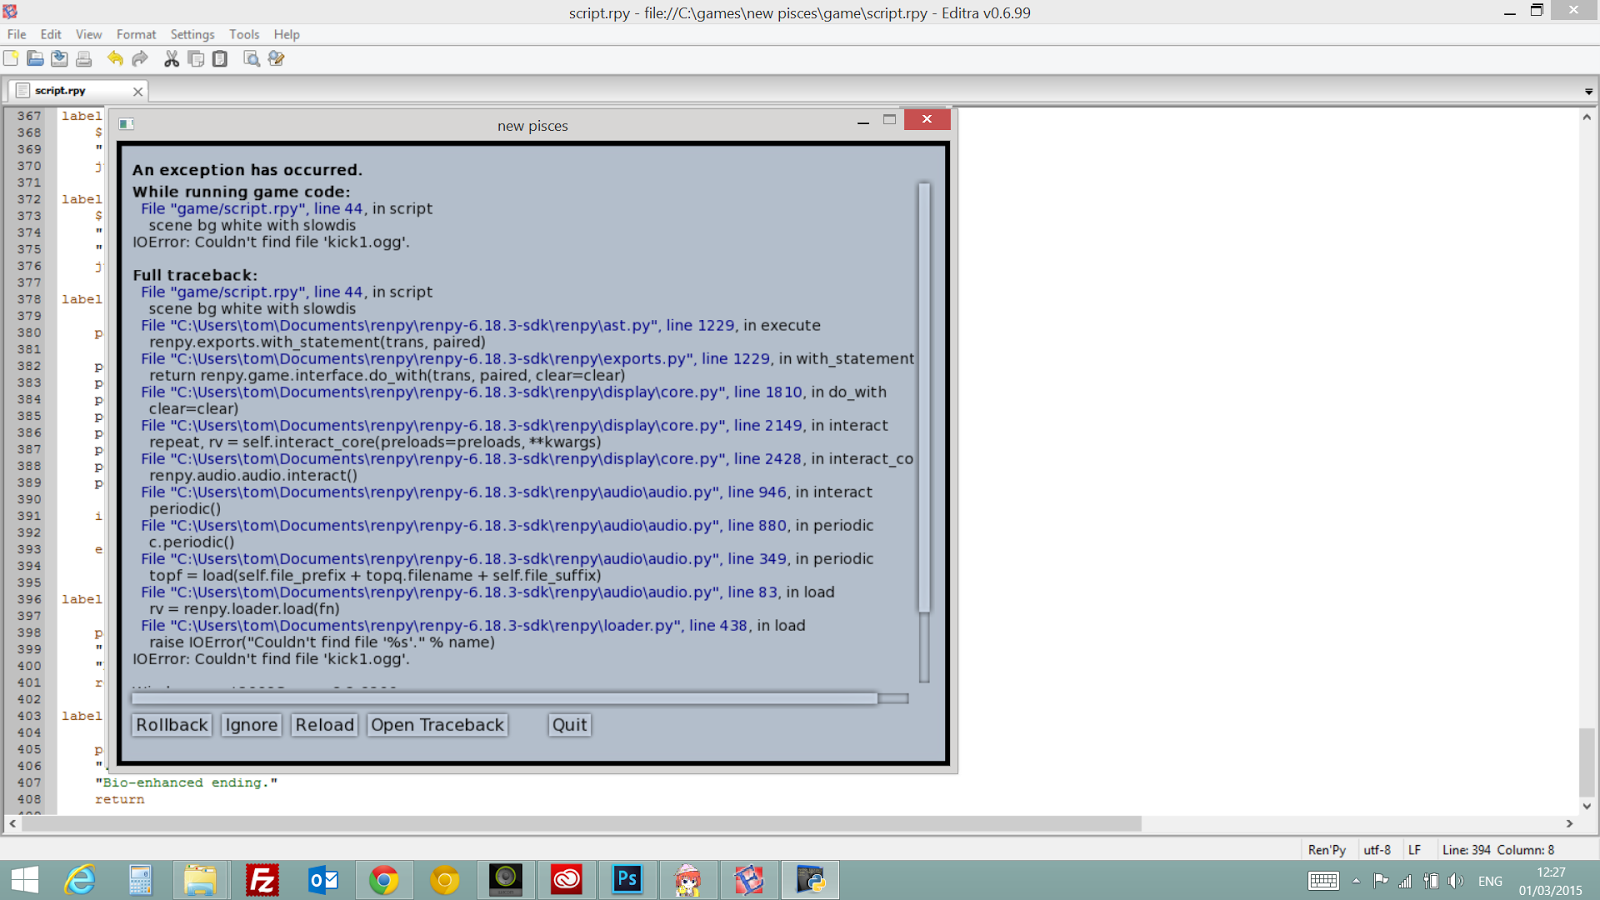 more errors!